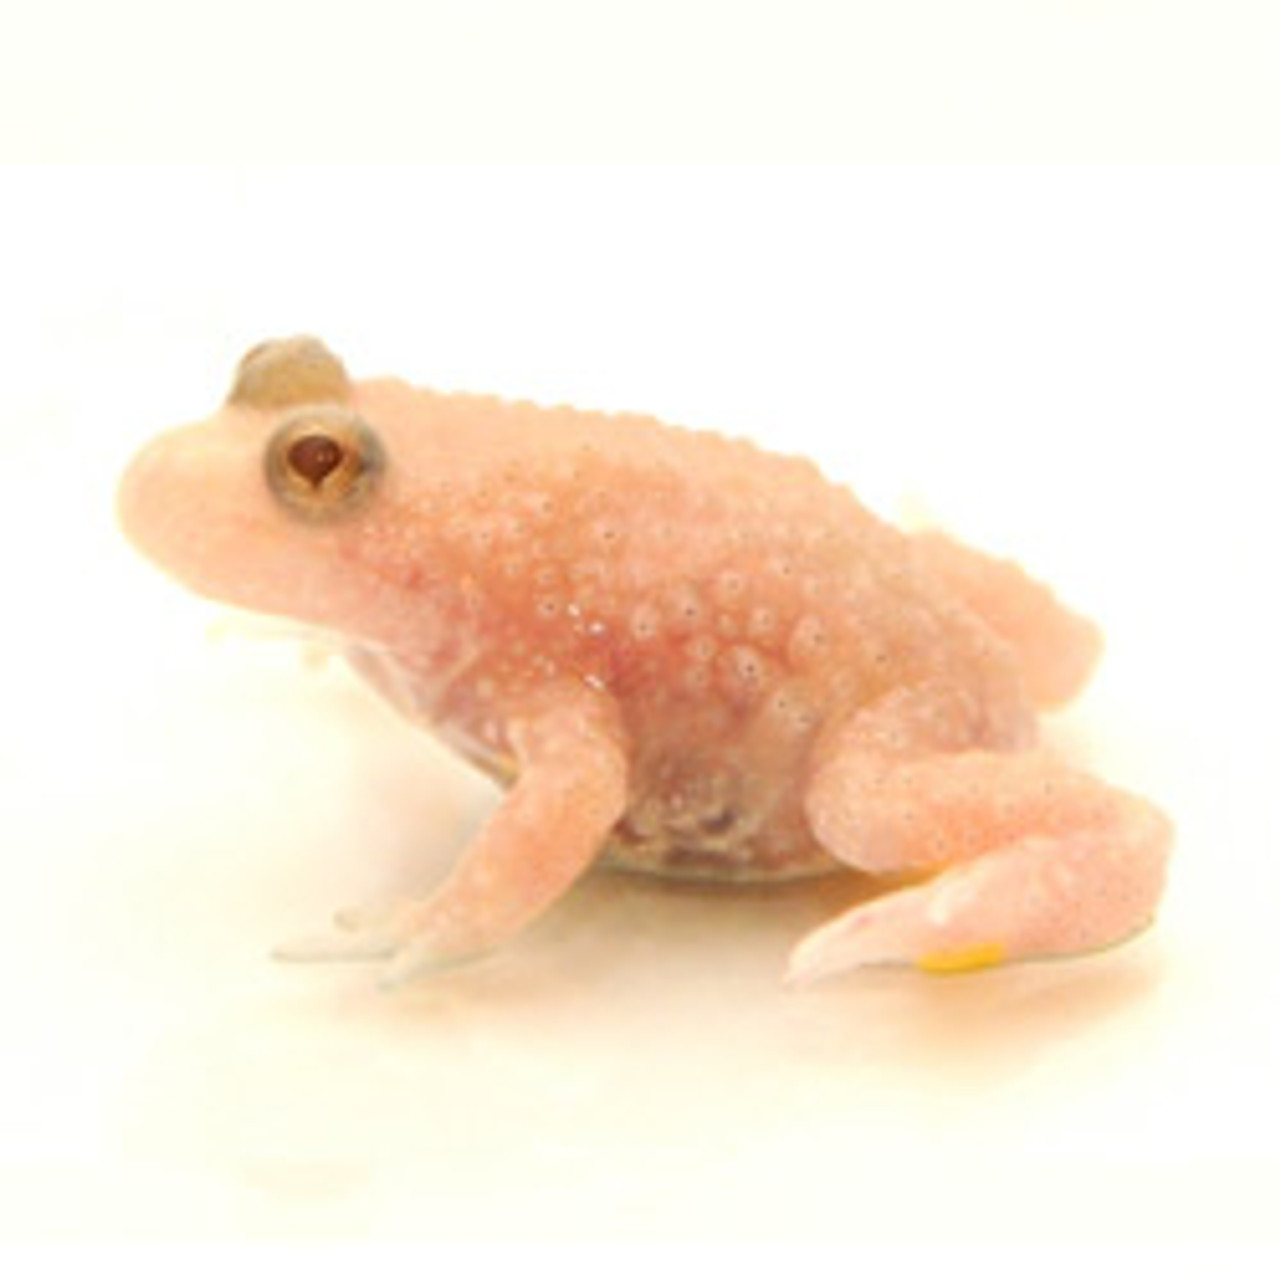 Albino Firebelly Toad (Bombina orientalis)